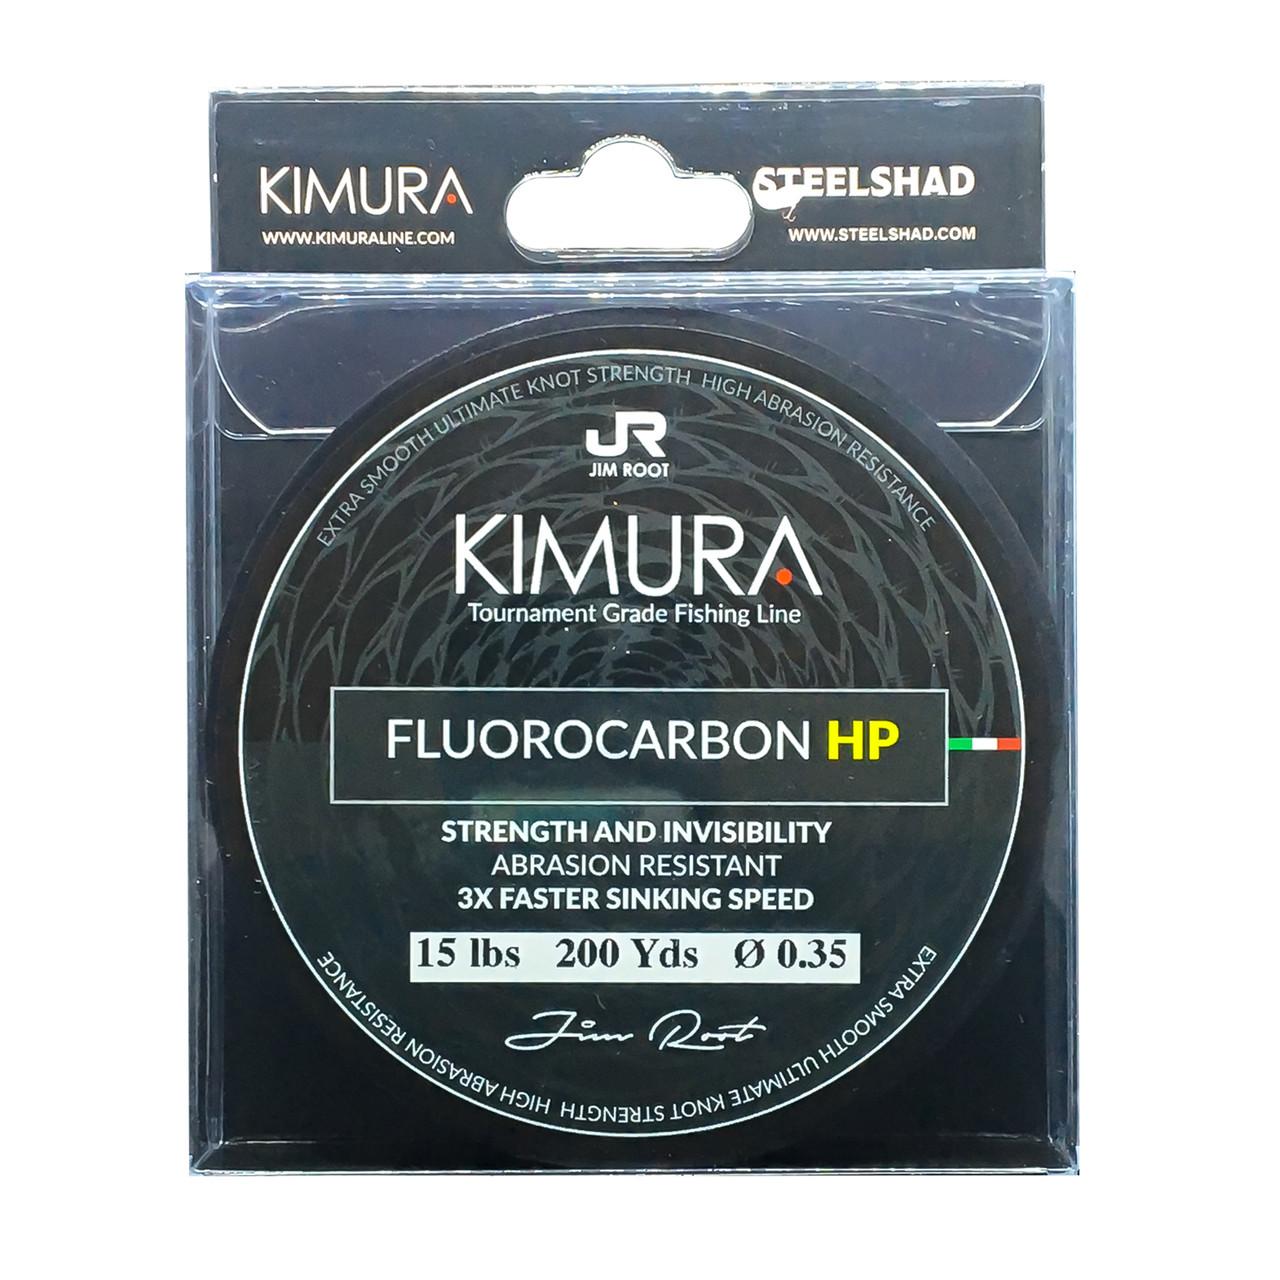 Fishing Line - Fluorocarbon